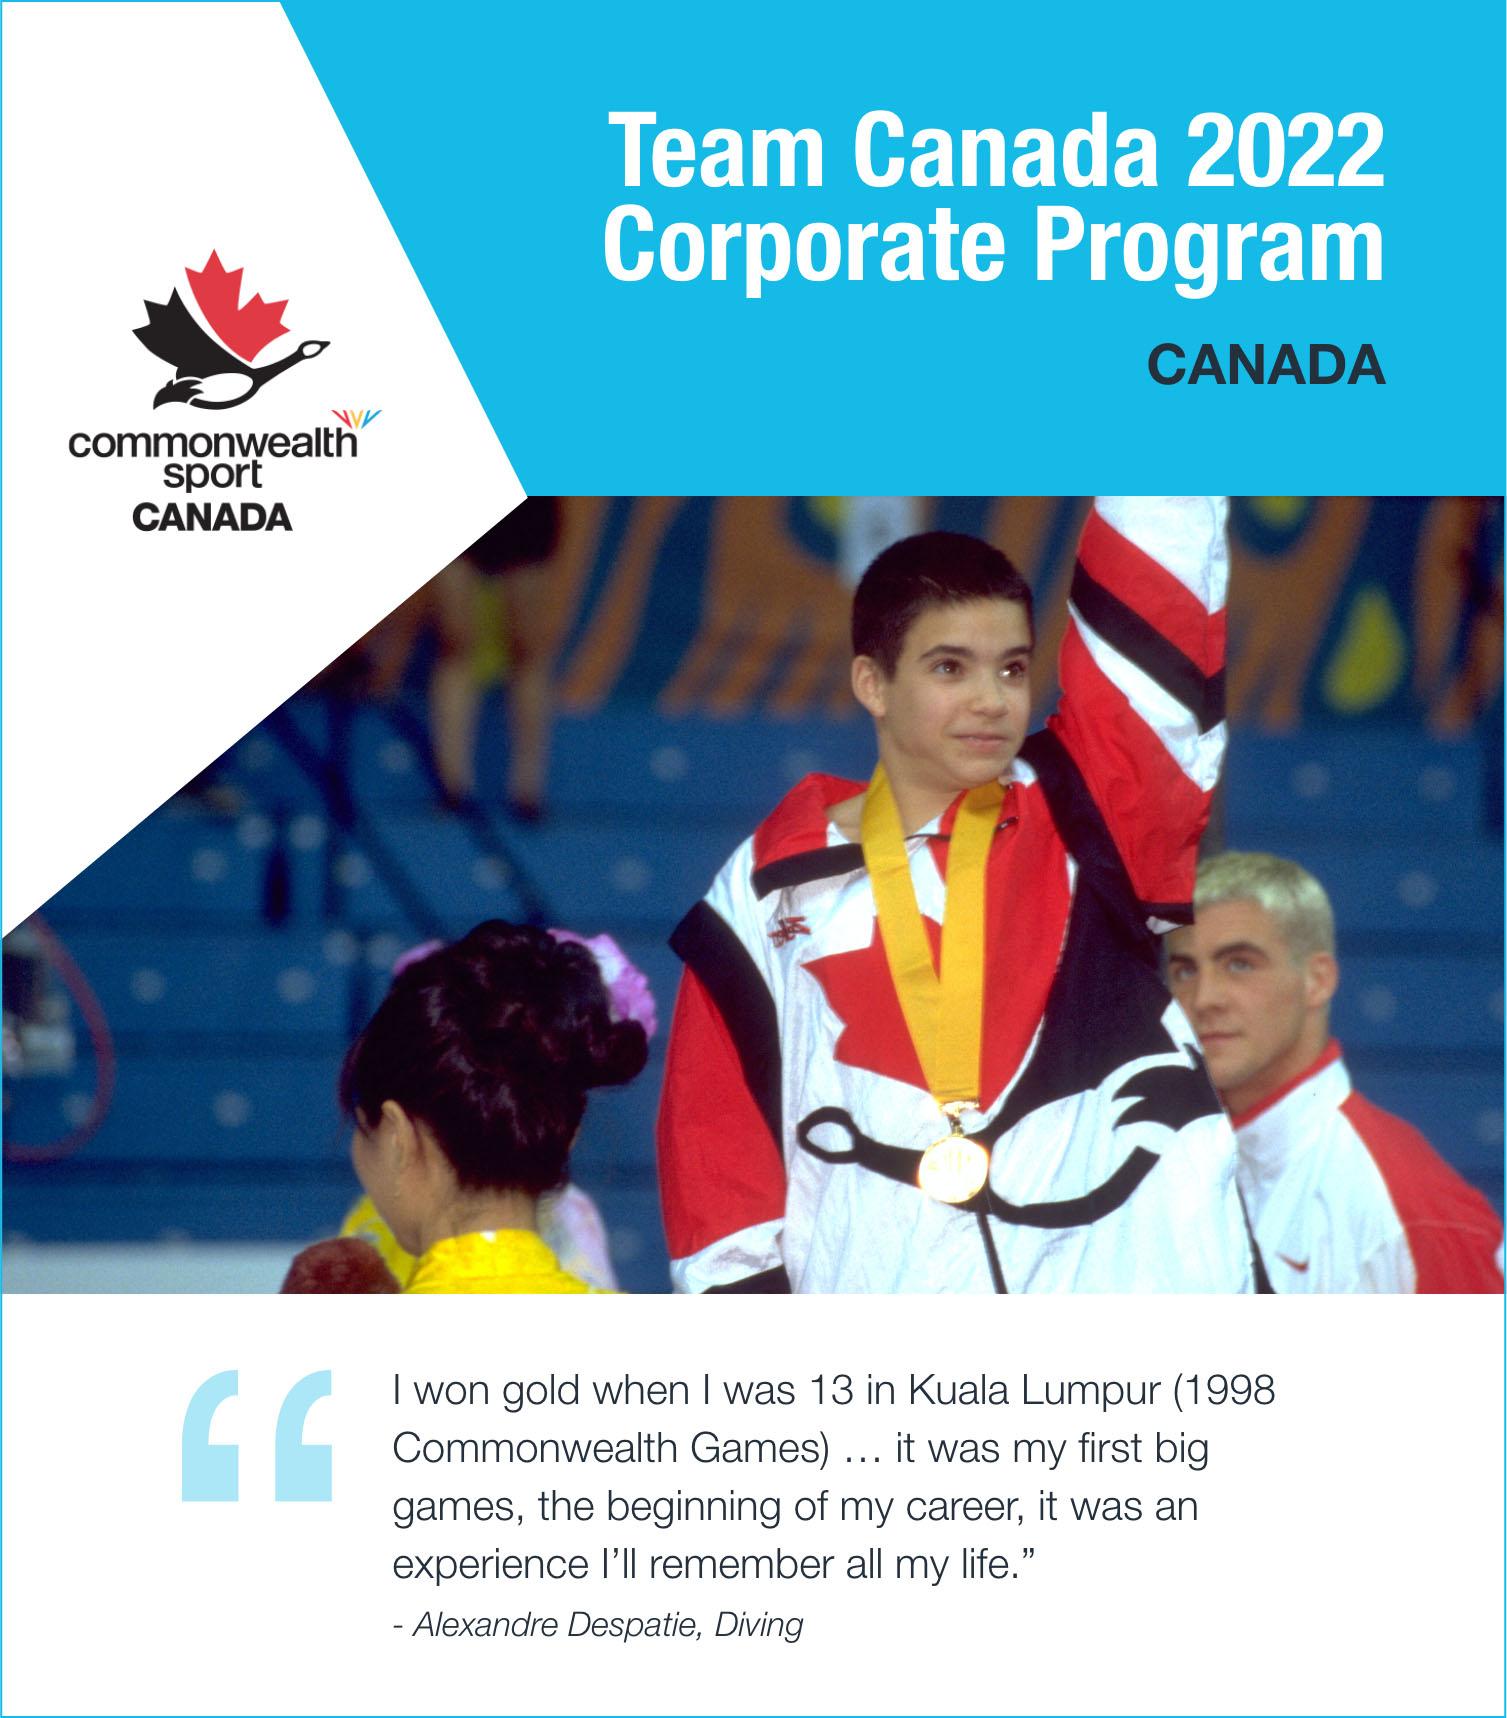 Team Canada 2022 Corporate Program - Canada